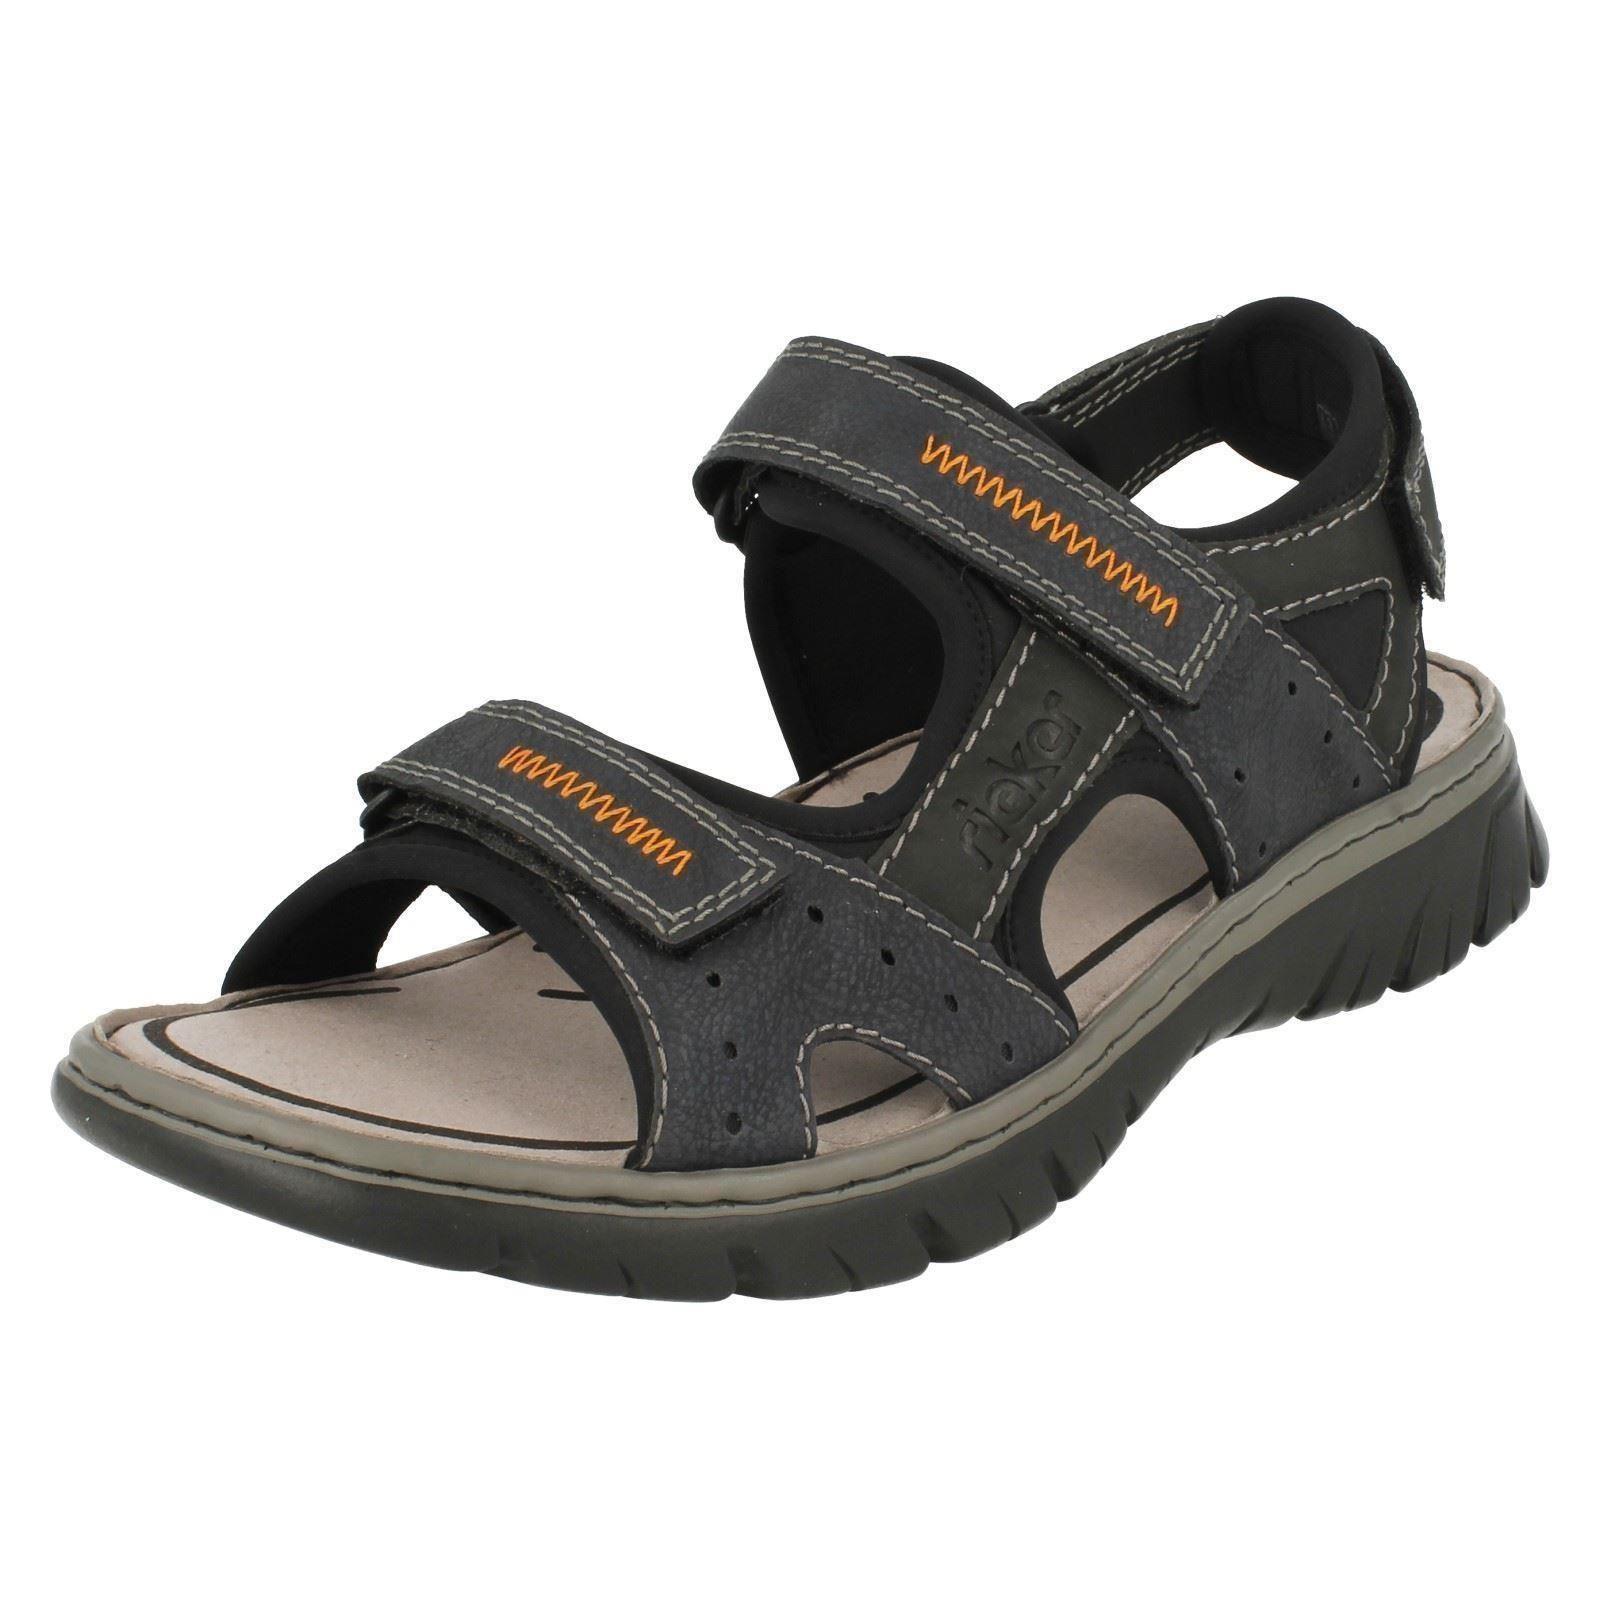 Mens Rieker Sandals Style - 26757